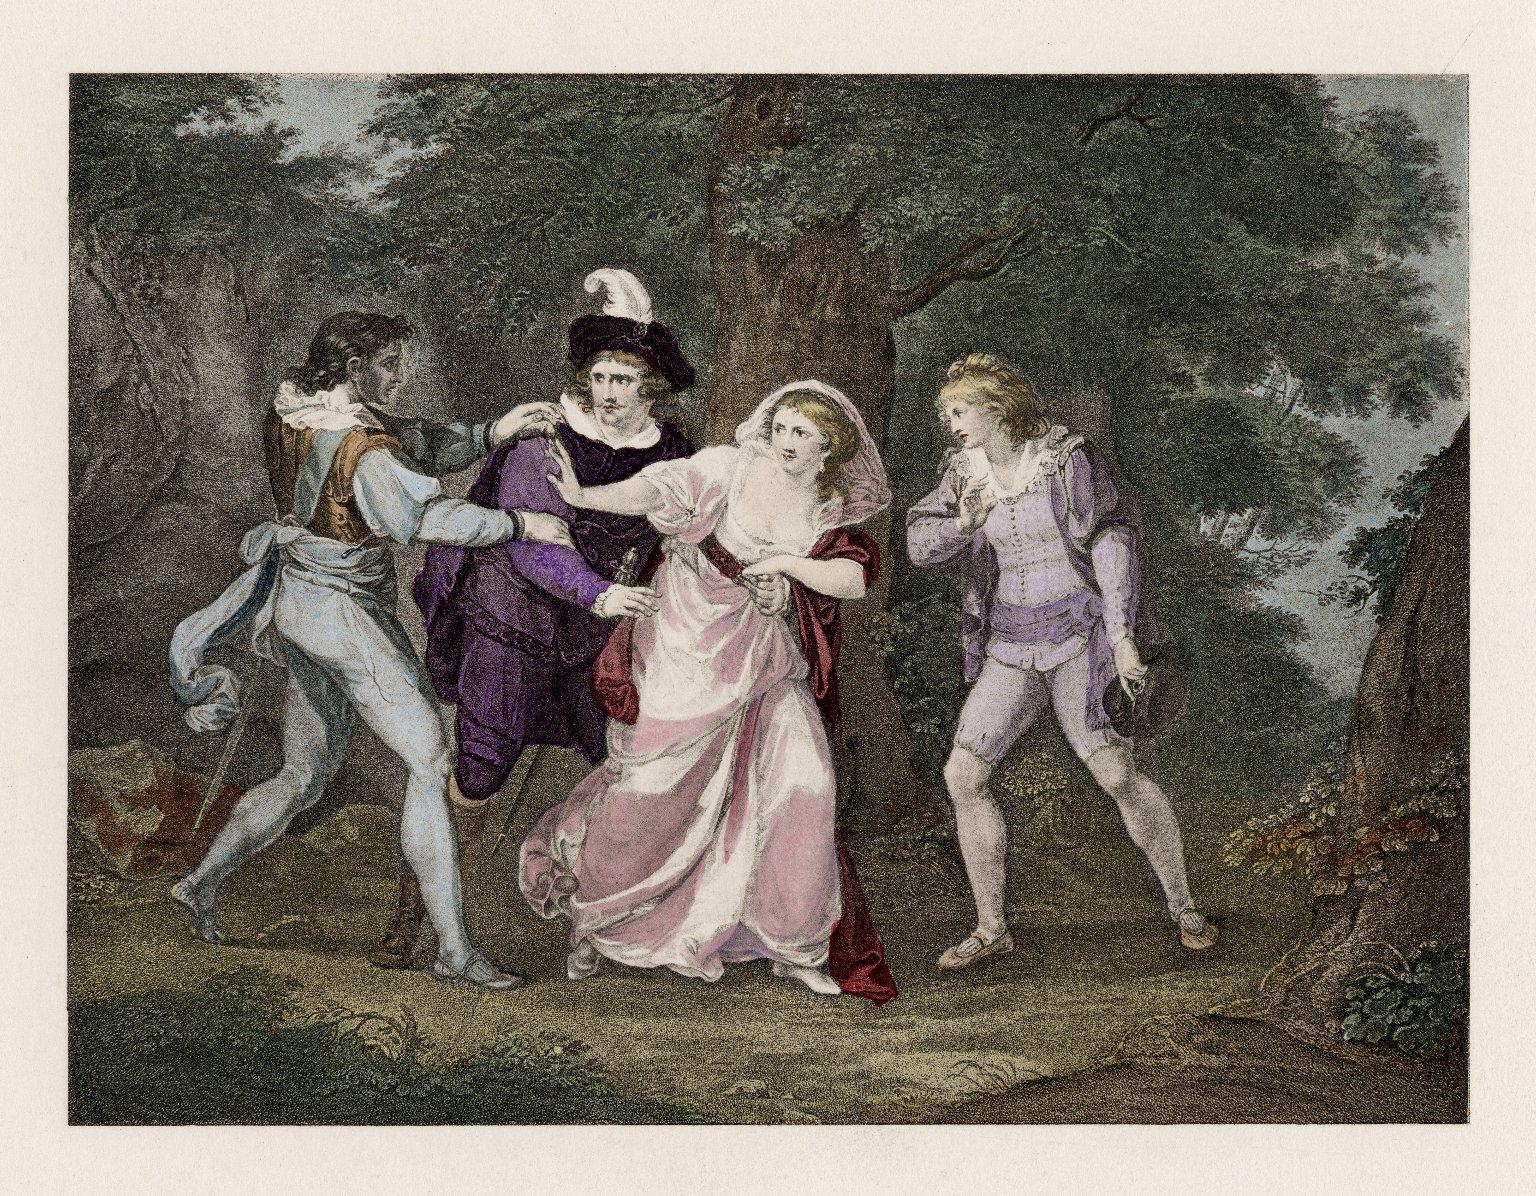 [Two gentlemen of Verona, Valentine, Proteus, Silvia, & Julia, act V, scene IV] [graphic] / [Kauffman del.].